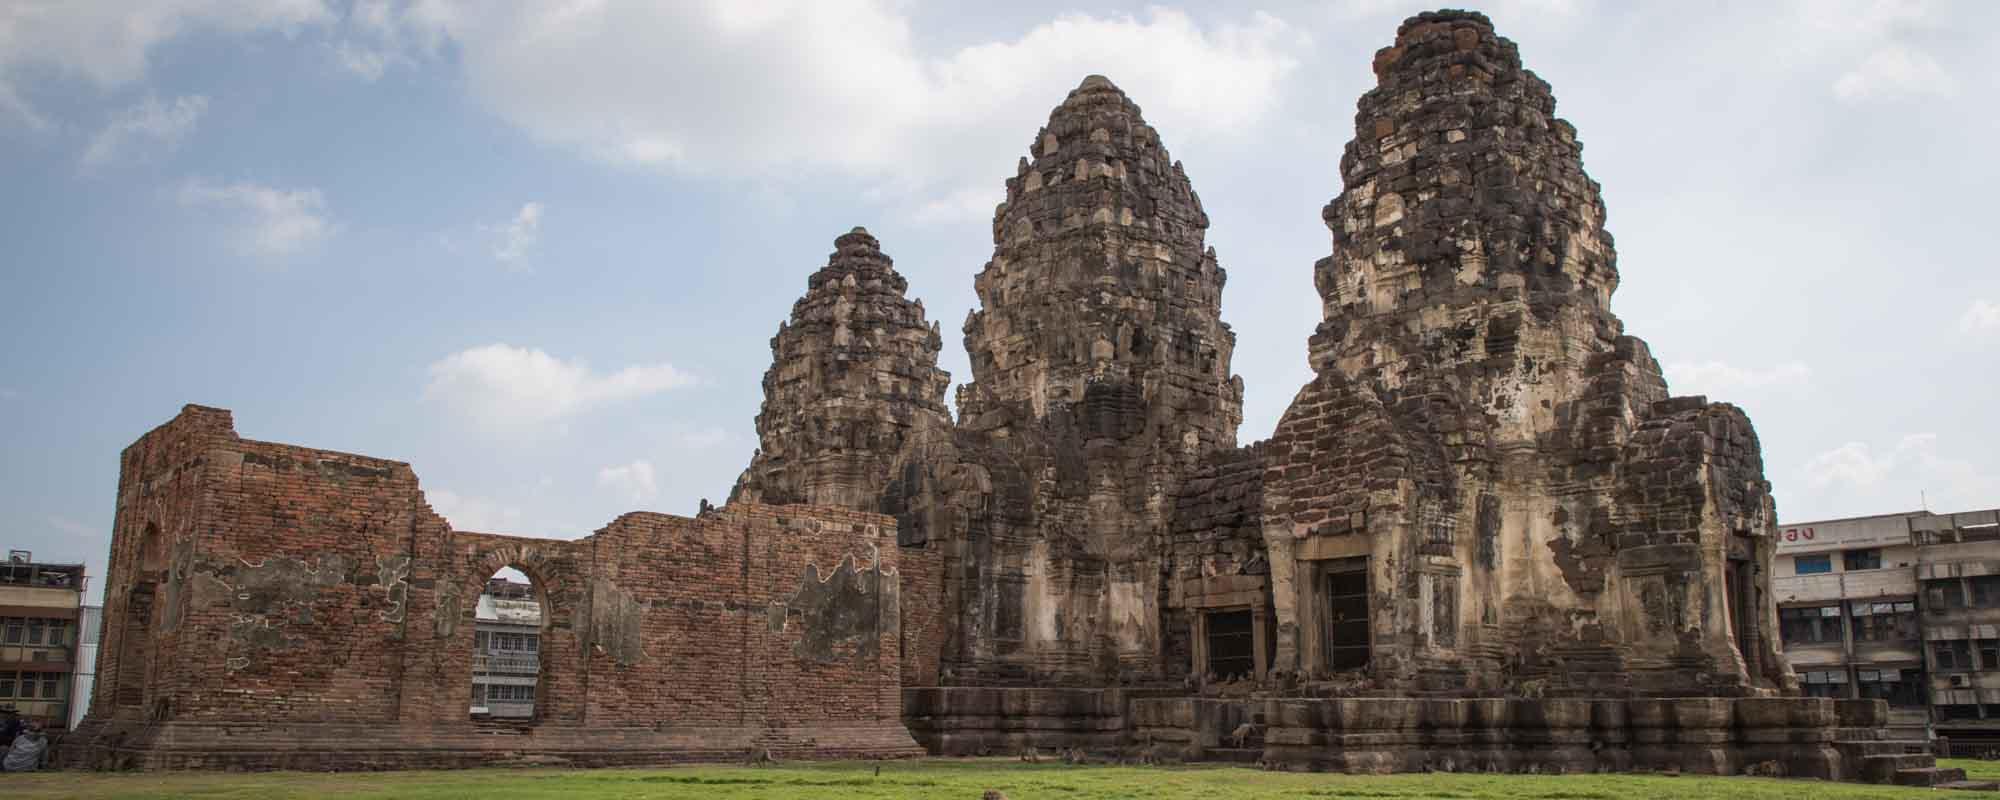 三峰塔 (Phra Prang Sam Yot)